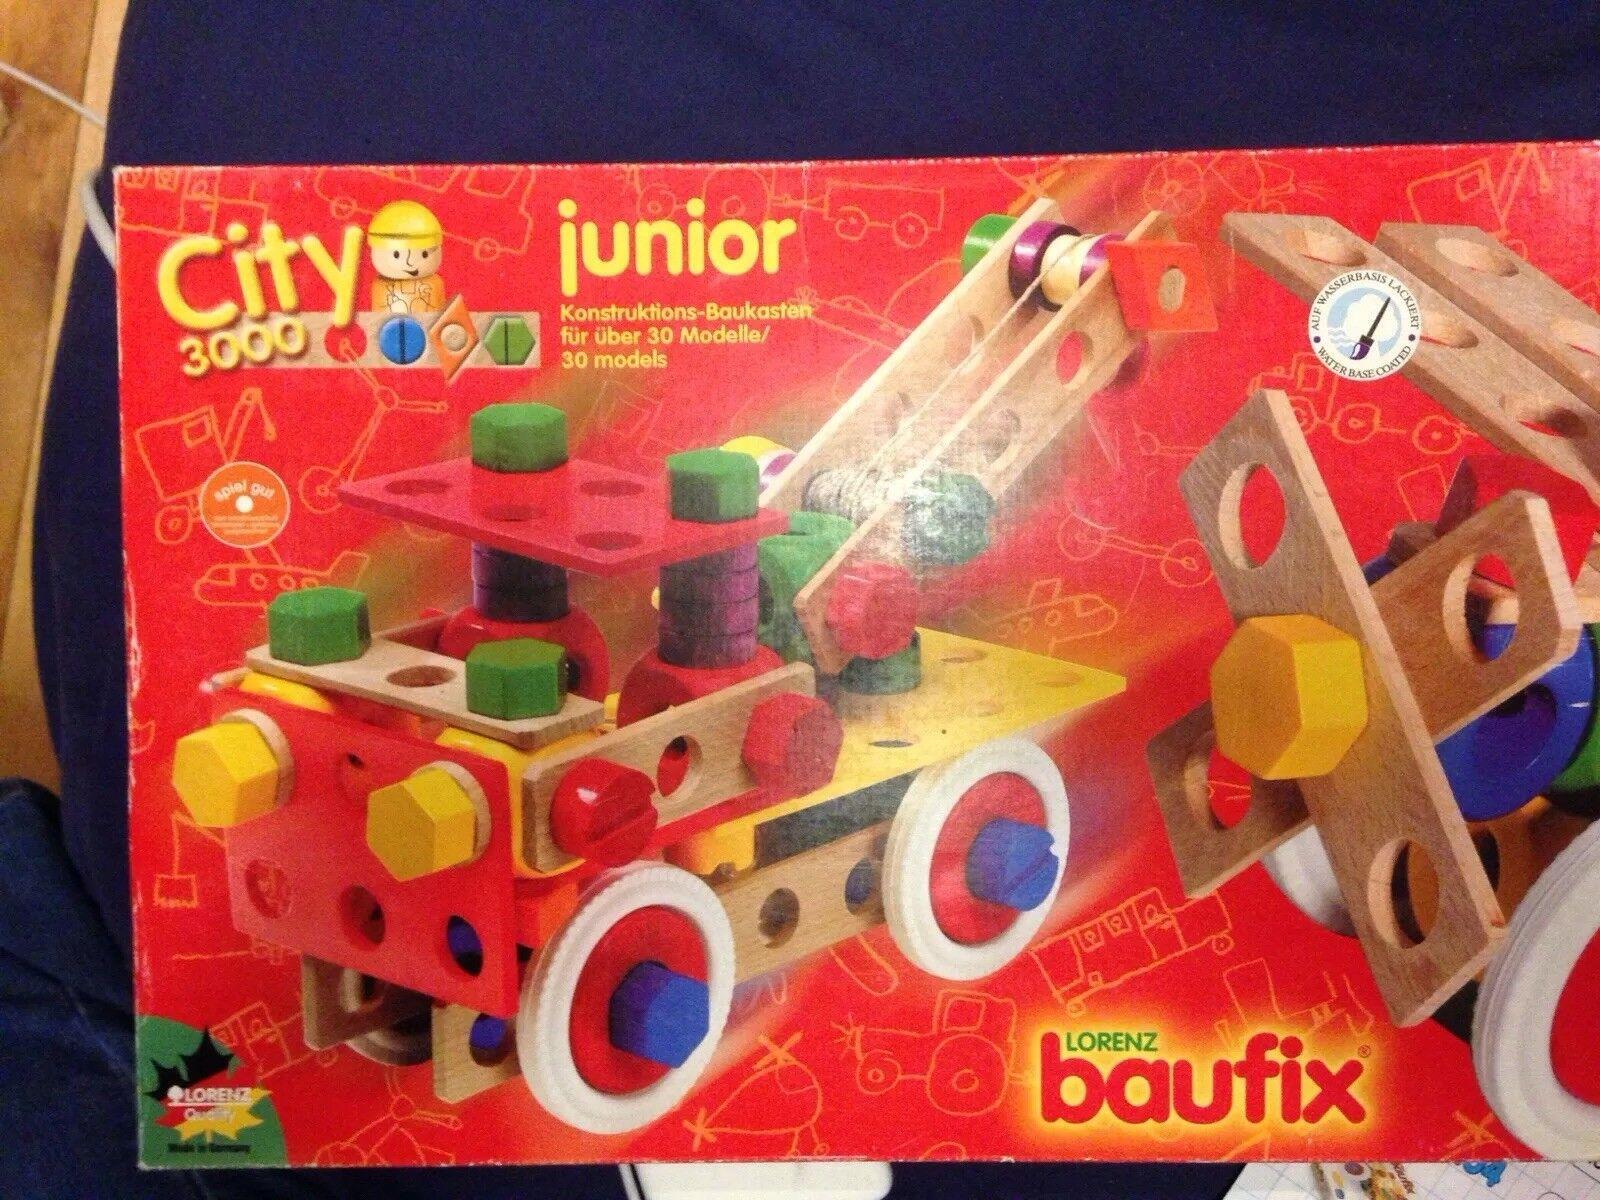 Toy construction set  Lorenz baufix City 3000 junior no. 071030